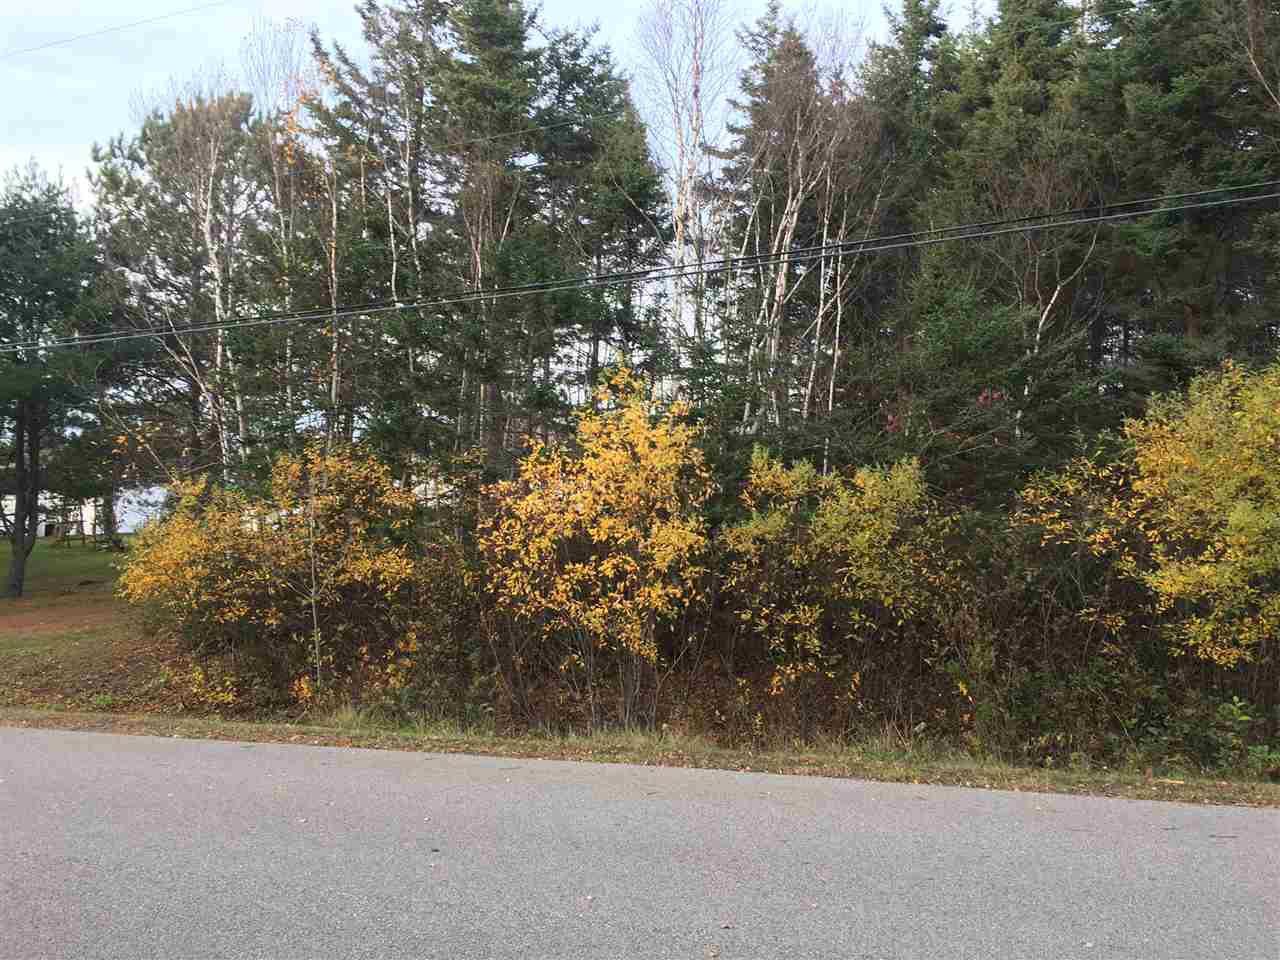 Main Photo: Lot Killkenny Lake Road in New Victoria: 203-Glace Bay Vacant Land for sale (Cape Breton)  : MLS®# 201925679